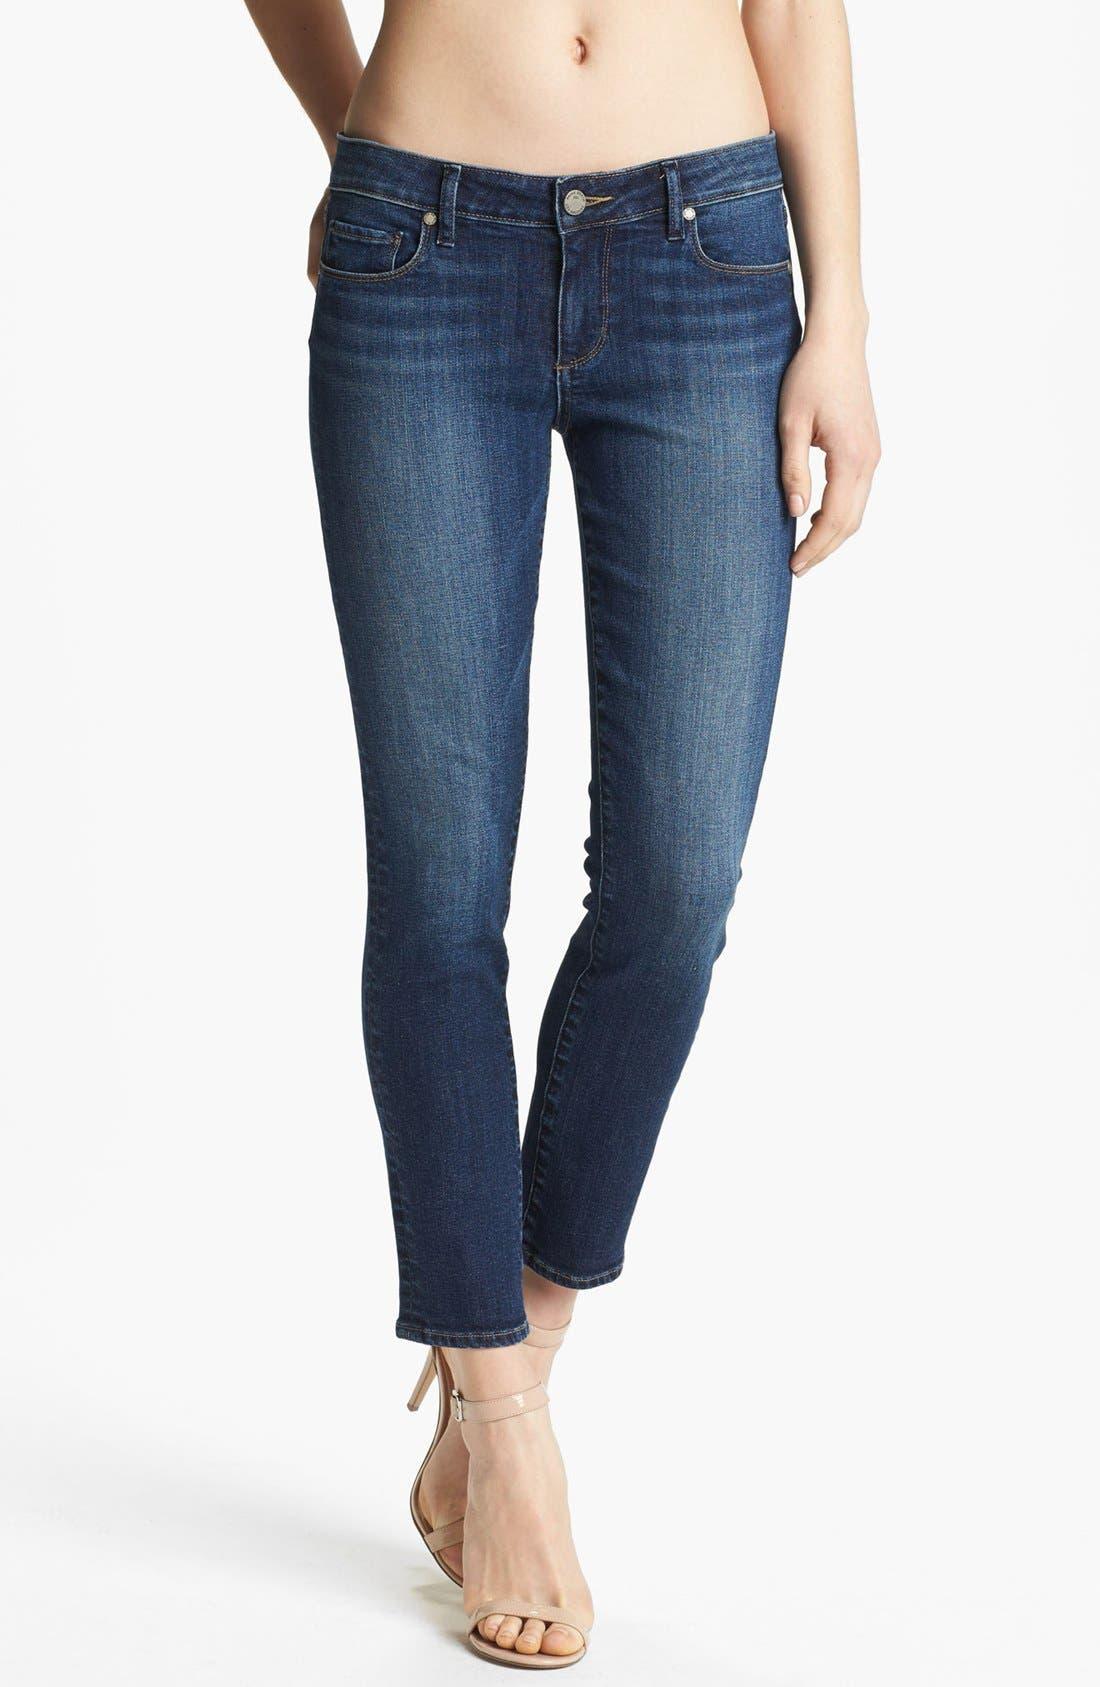 Main Image - Paige Denim 'Skyline' Ankle Jeans (Benny)